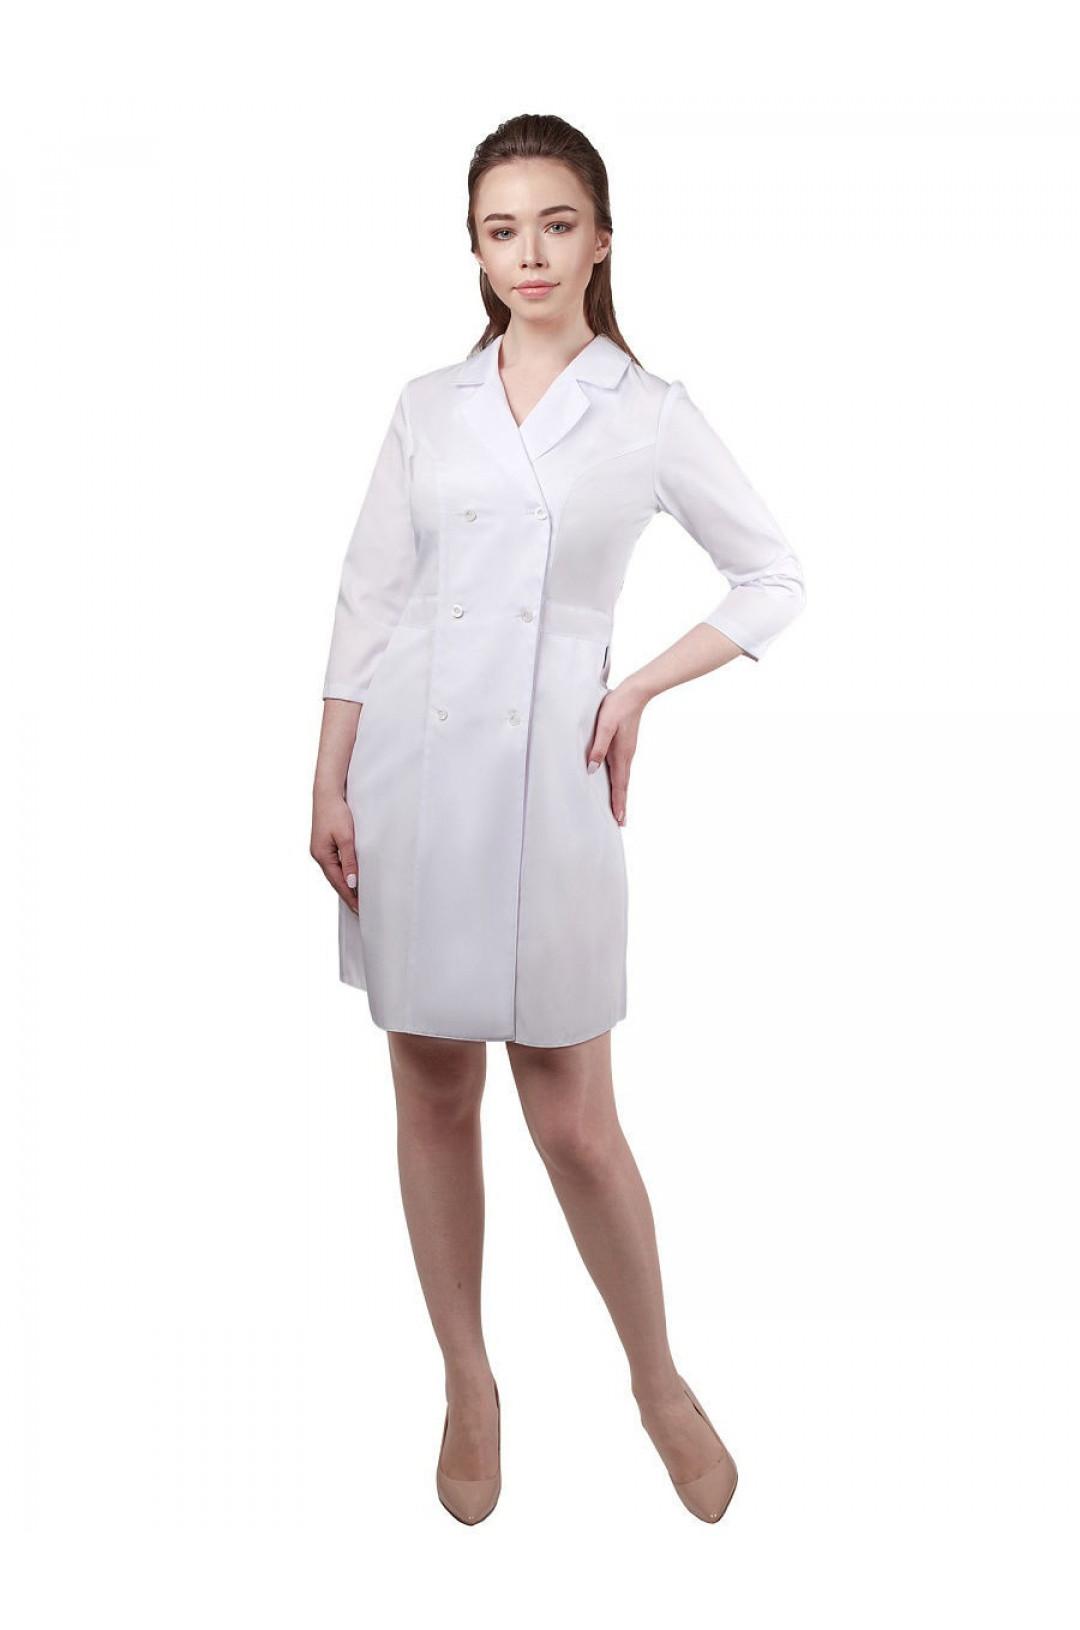 Халат медицинский женский 283 (белый, сатори)